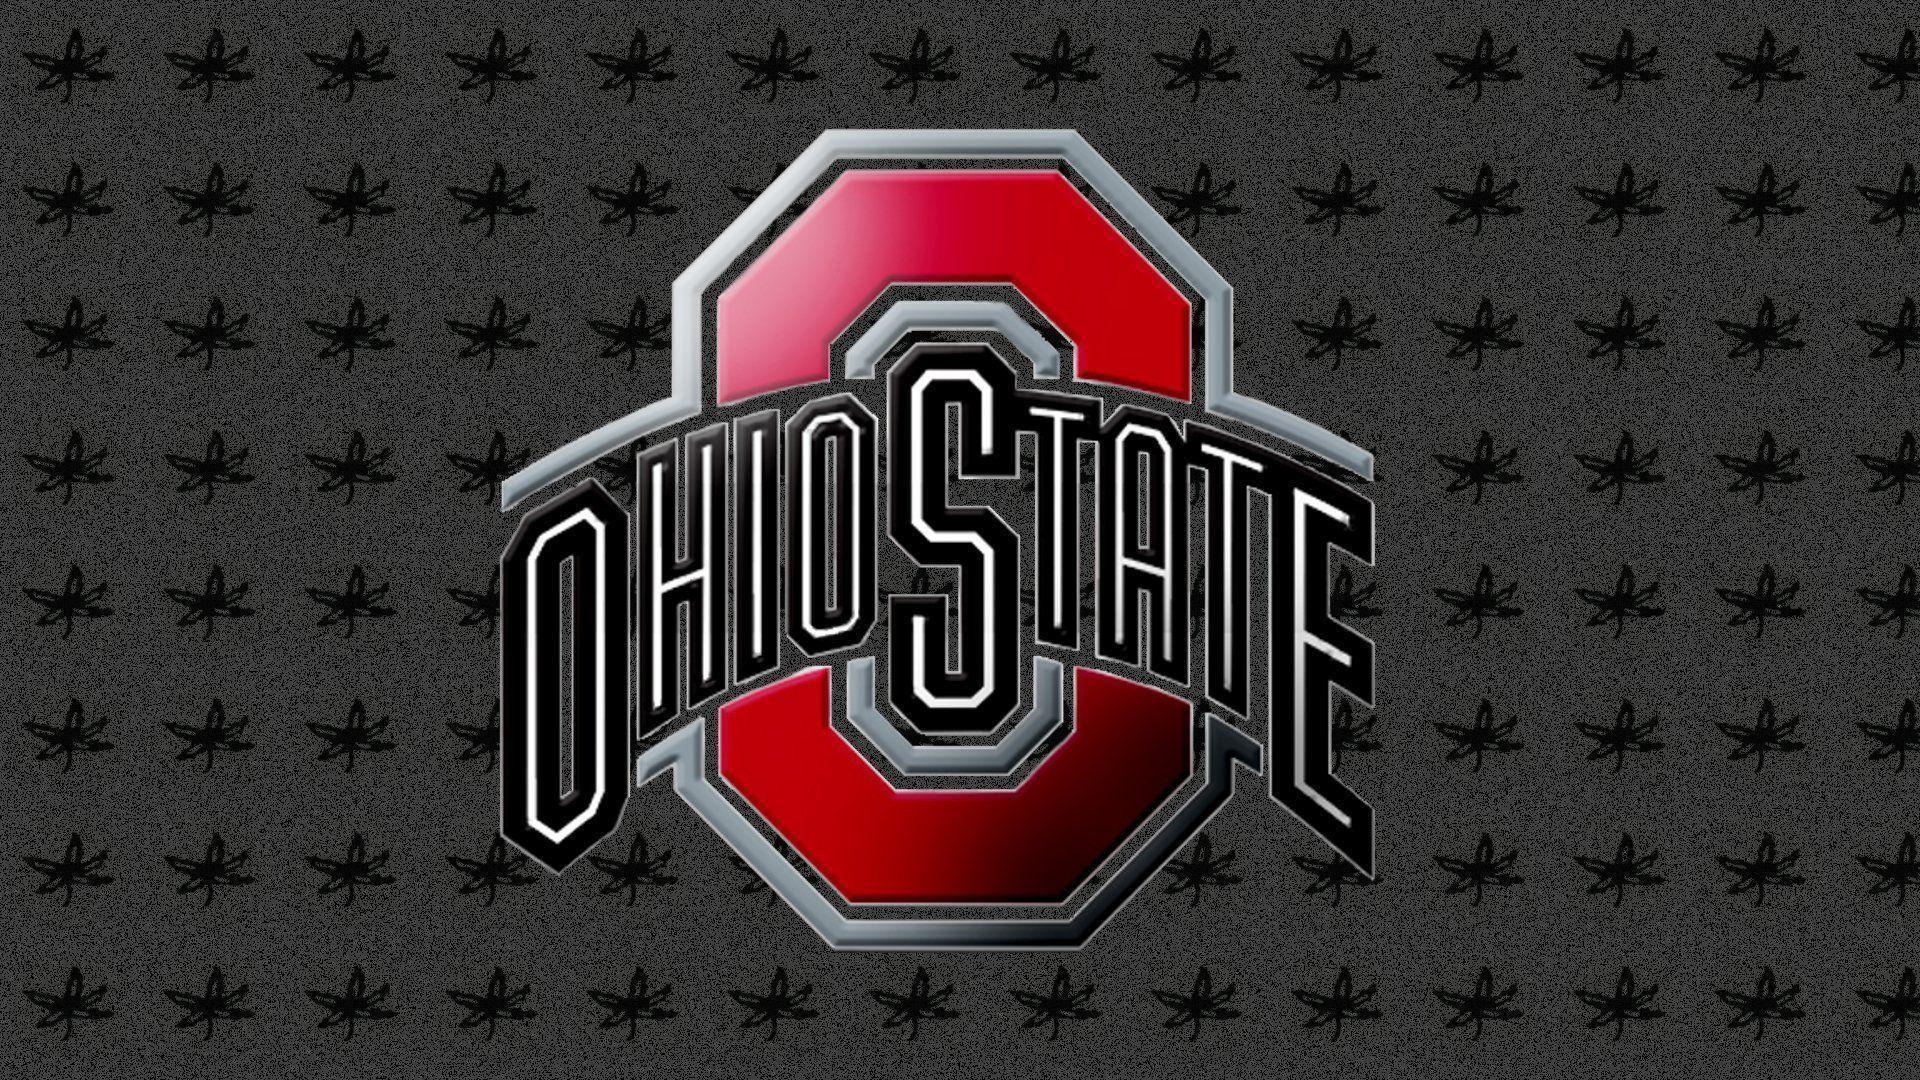 OSU Desktop Wallpaper 55 – Ohio State Football Wallpaper (28971119 .